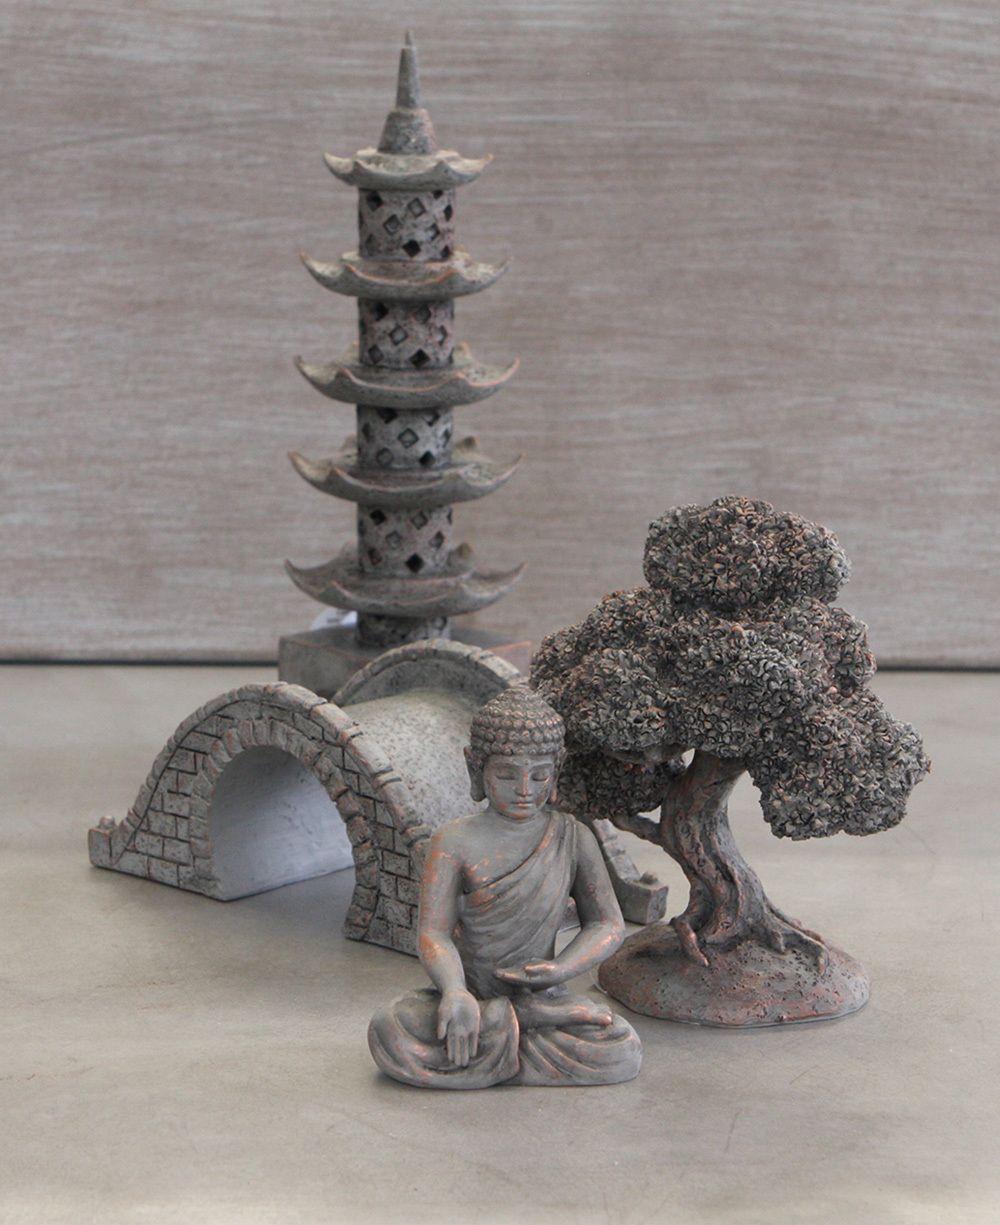 Buddha garden oasis set miniature statue zen garden set zen pinterest buddha garden - Zen garten miniatur set ...